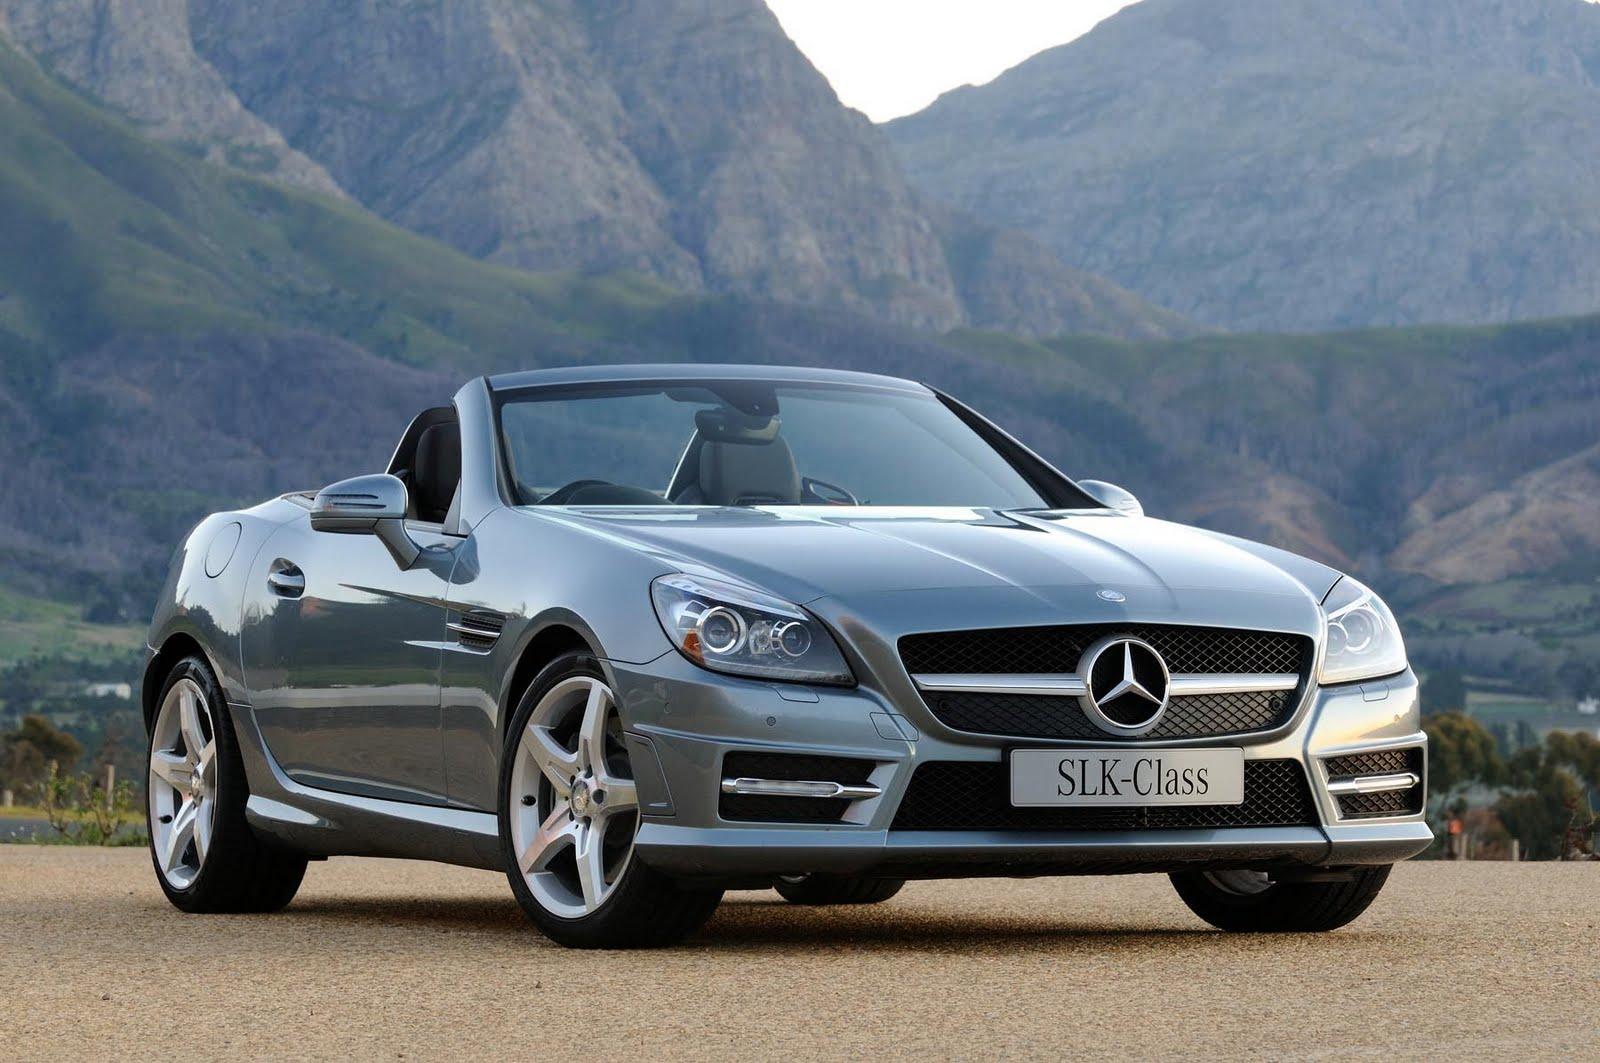 In4ride New 2012 Mercedes Benz Slk Now In Mzansi